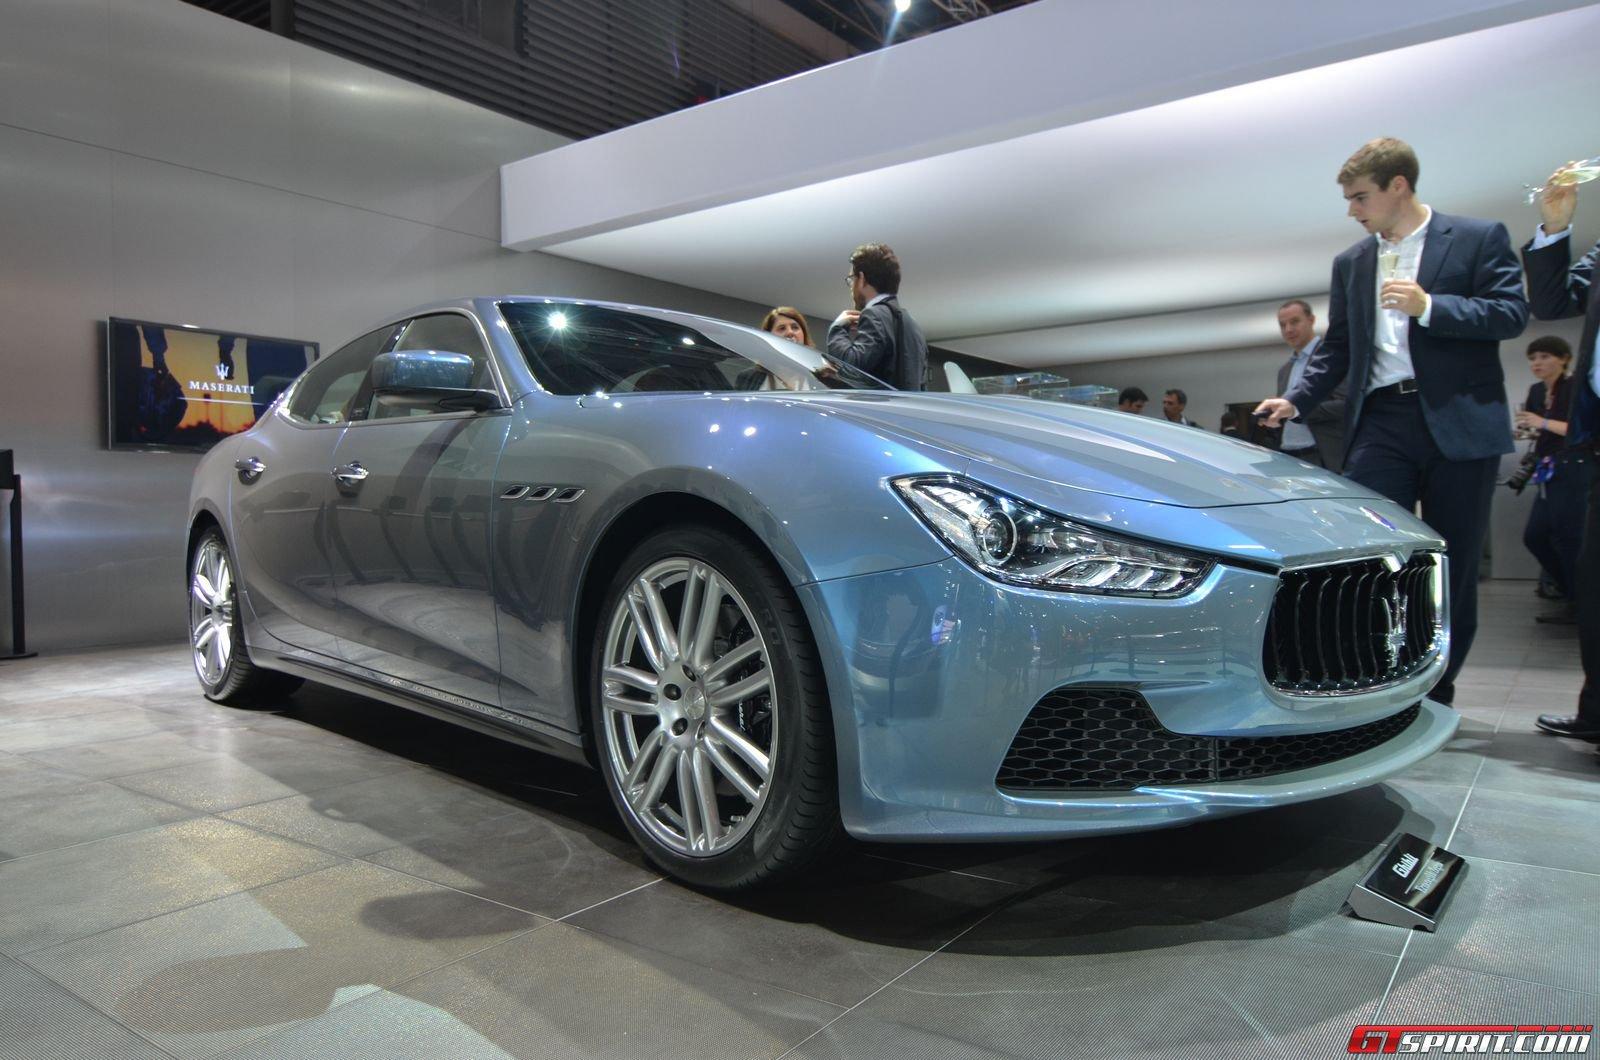 Paris 2014: 2015 Maserati Ghibli Ermenegildo Zegna Edition - GTspirit